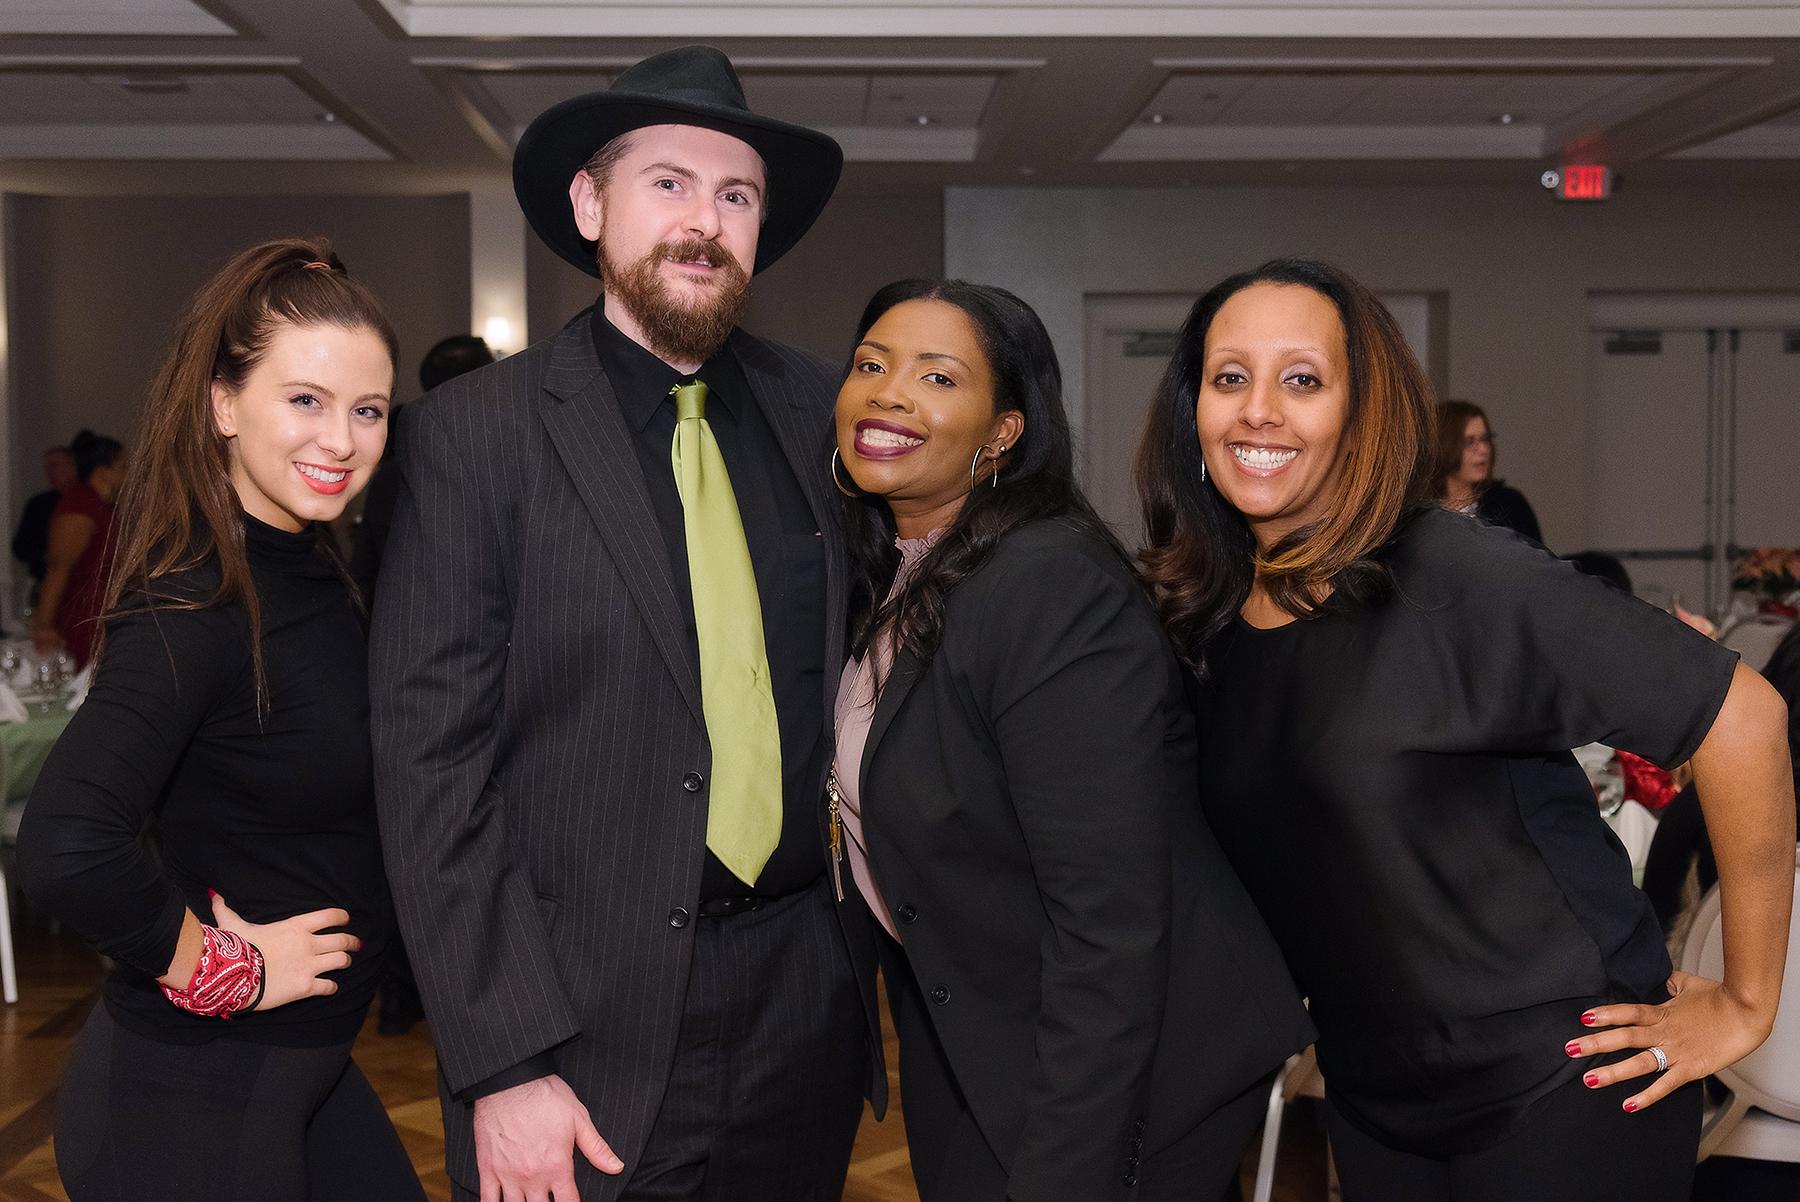 Signal Financial Holiday Party Corporate Washington D.C. Photography02.jpg